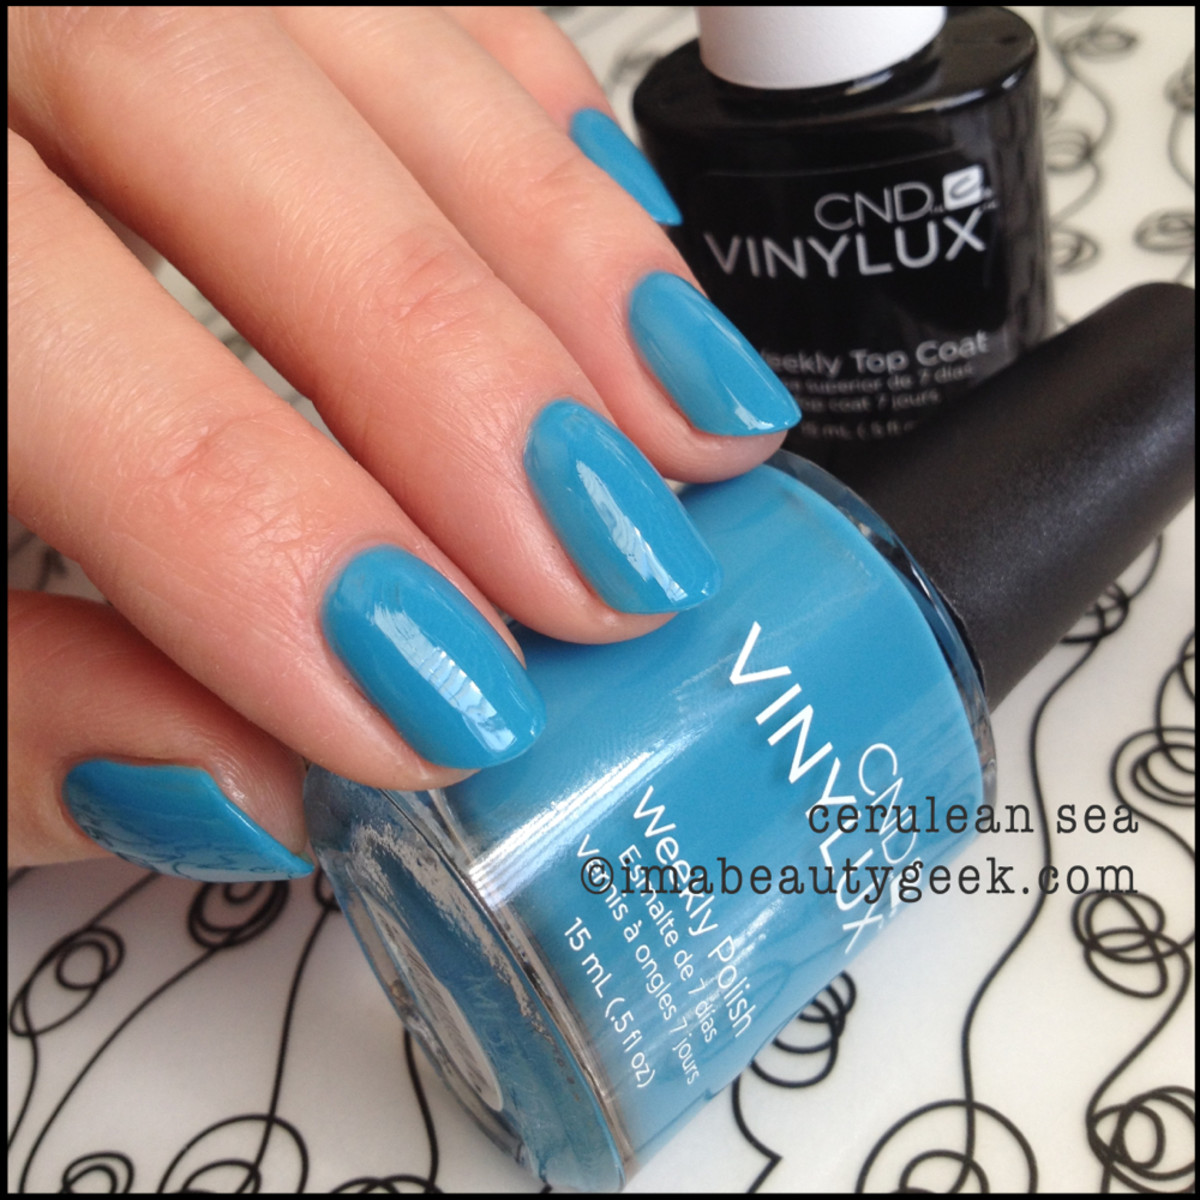 CND vinyulx Cerulean Sea_CND Vinylux summer 2014